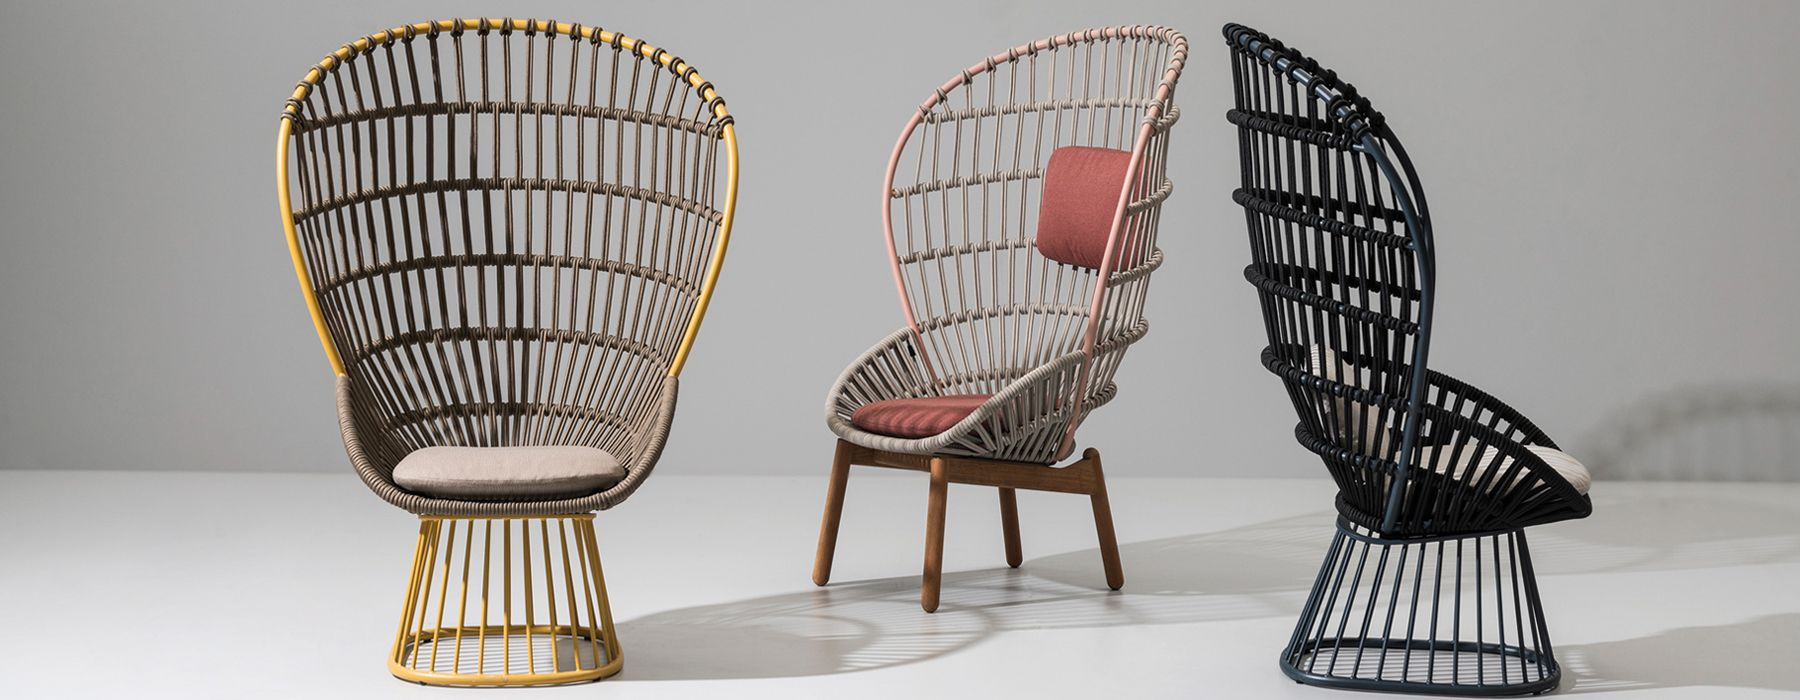 KETTAL Cala Chair   Outdoor by Doshi Levien   design_singulier ...